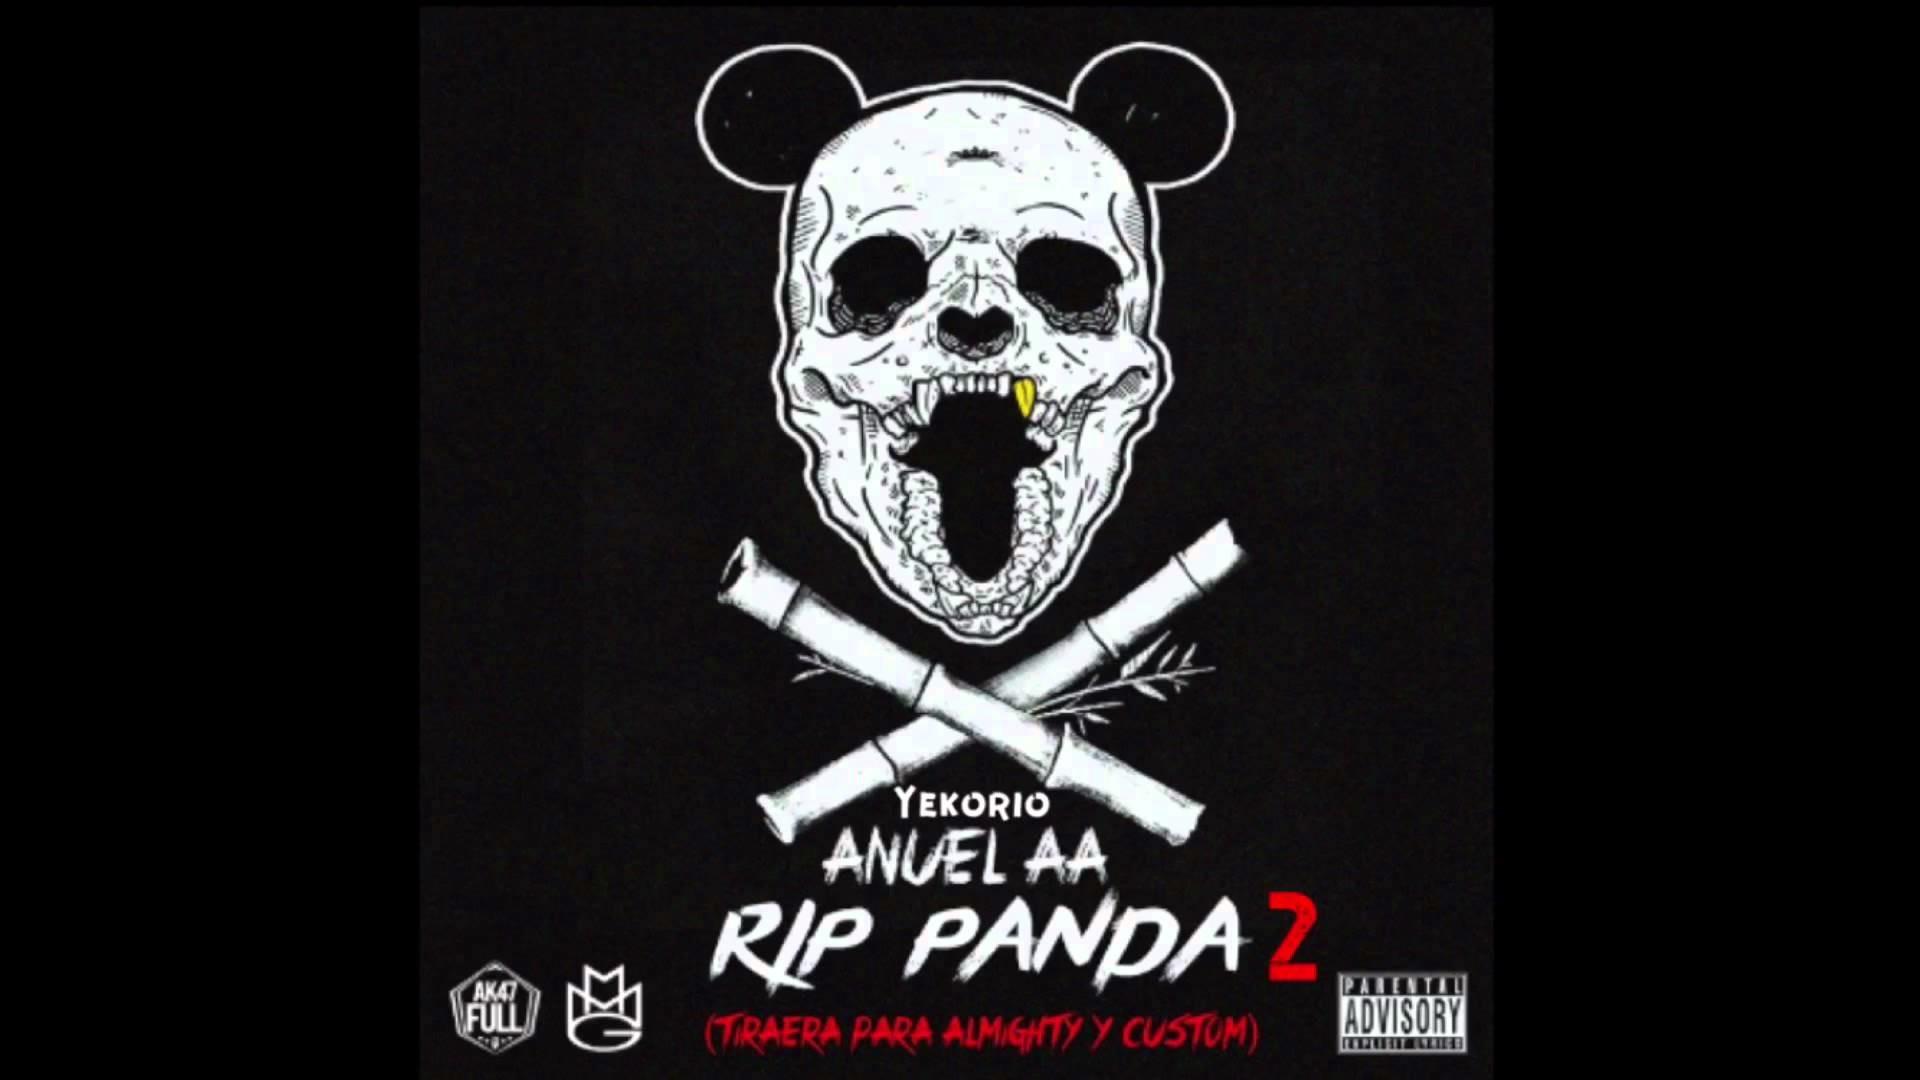 Anuel AA Ft. Yekorio – RIP Panda 2 (Official Remix) – YouTube